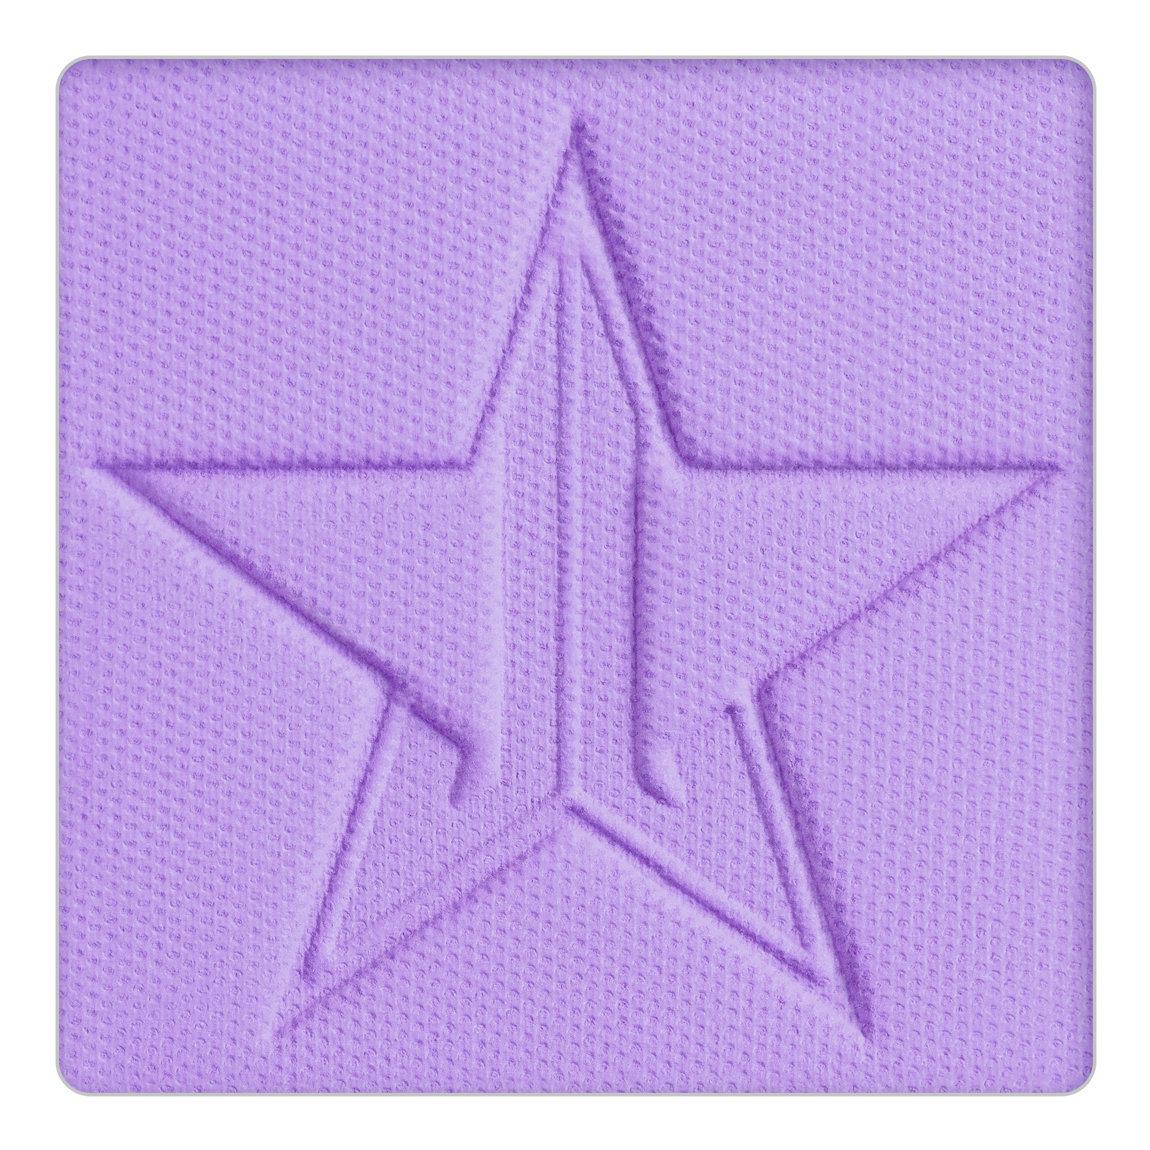 Jeffree Star Cosmetics Artistry Singles Gum Drop alternative view 1.